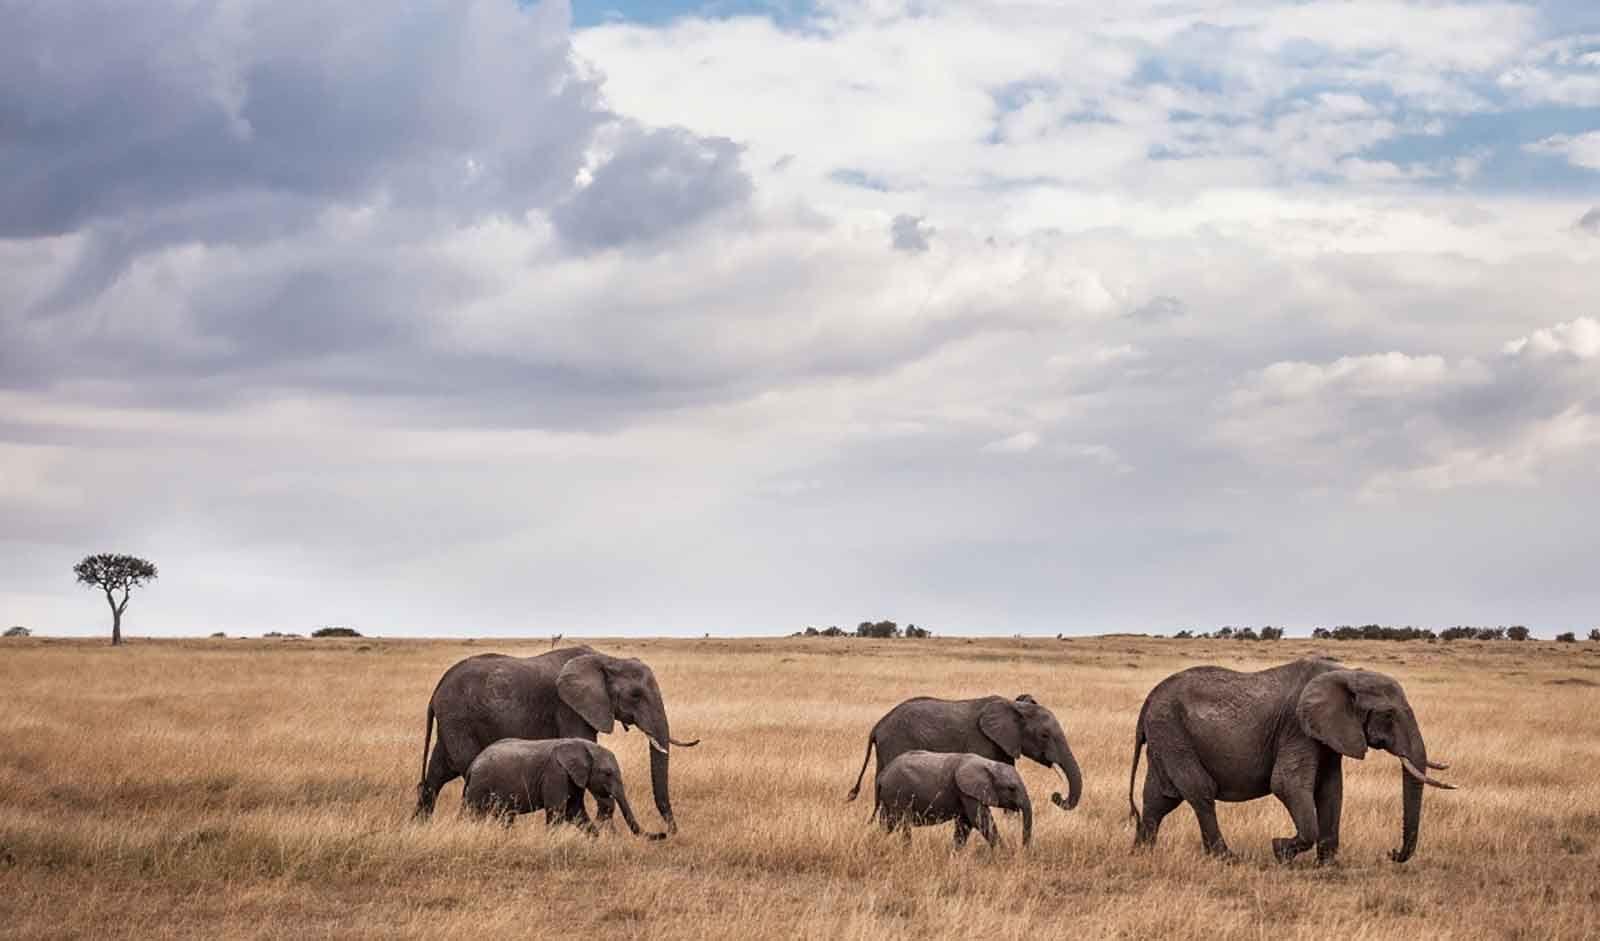 Amboseli, Lake Nakuru & Mara in Style